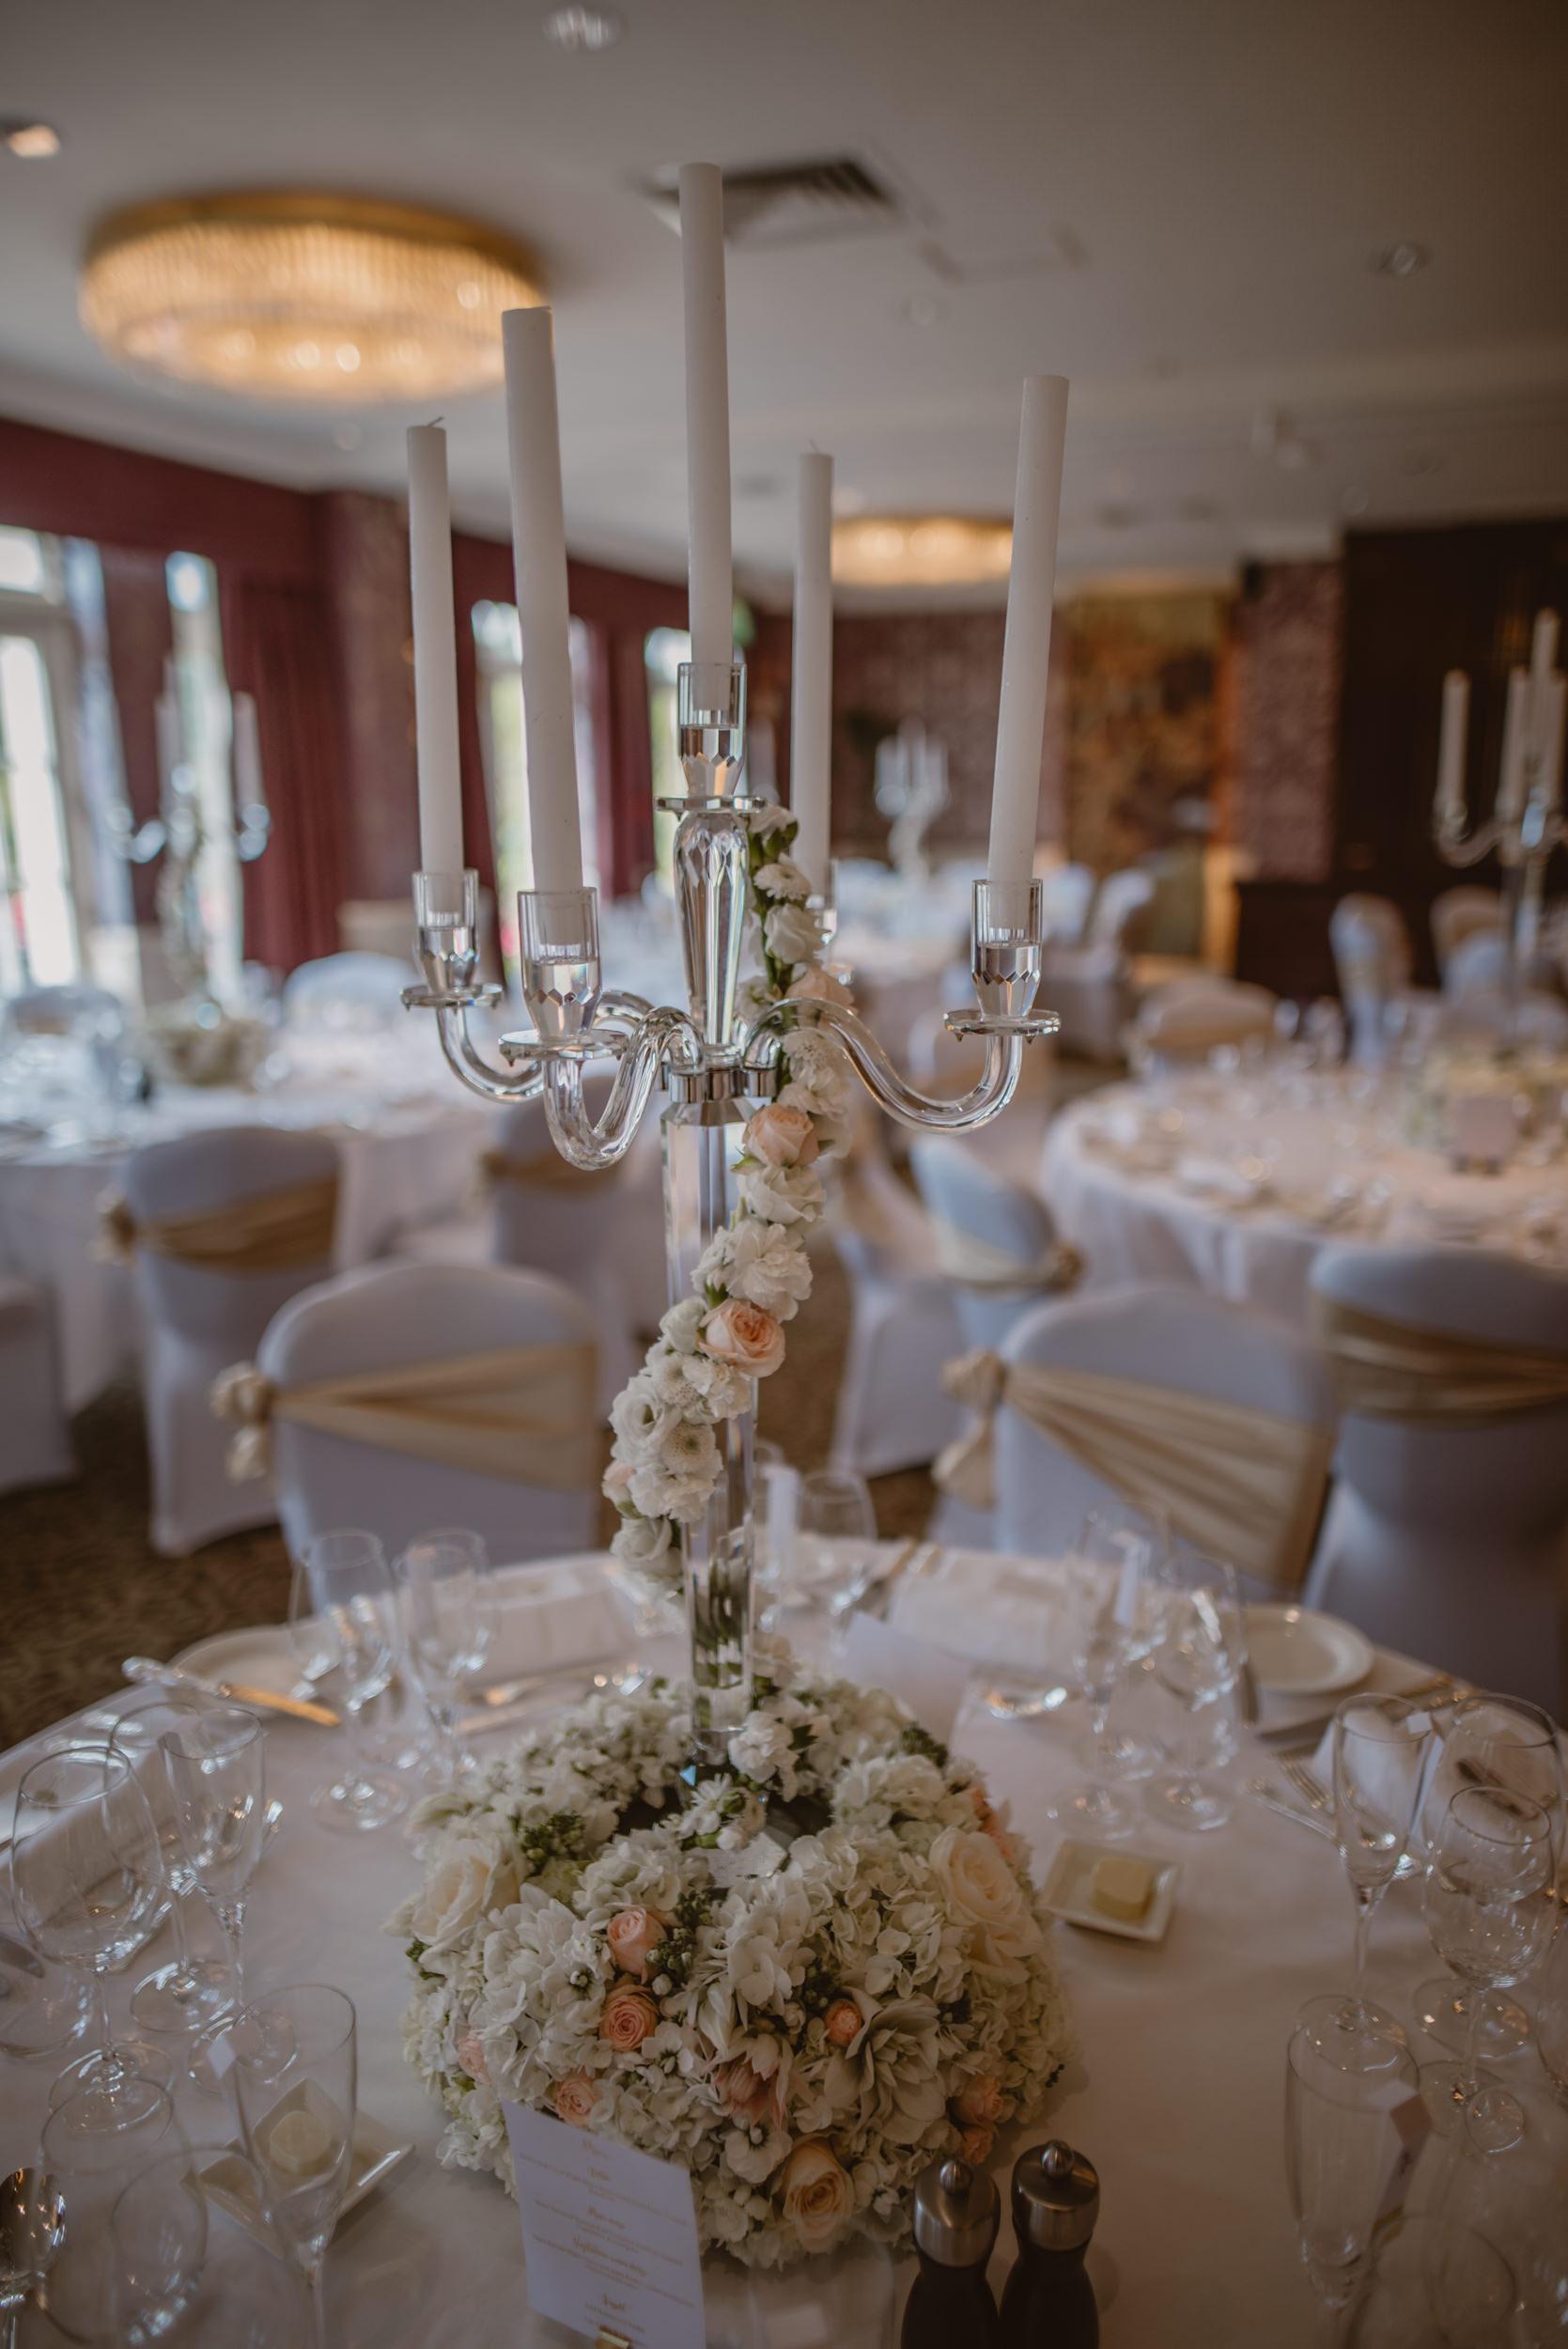 Trisha-and-Roger-wedding-The-Priory-Church-and-Chewton-Glen-Hotel-Christchurch-Manu-Mendoza-Wedding-Photography-269.jpg